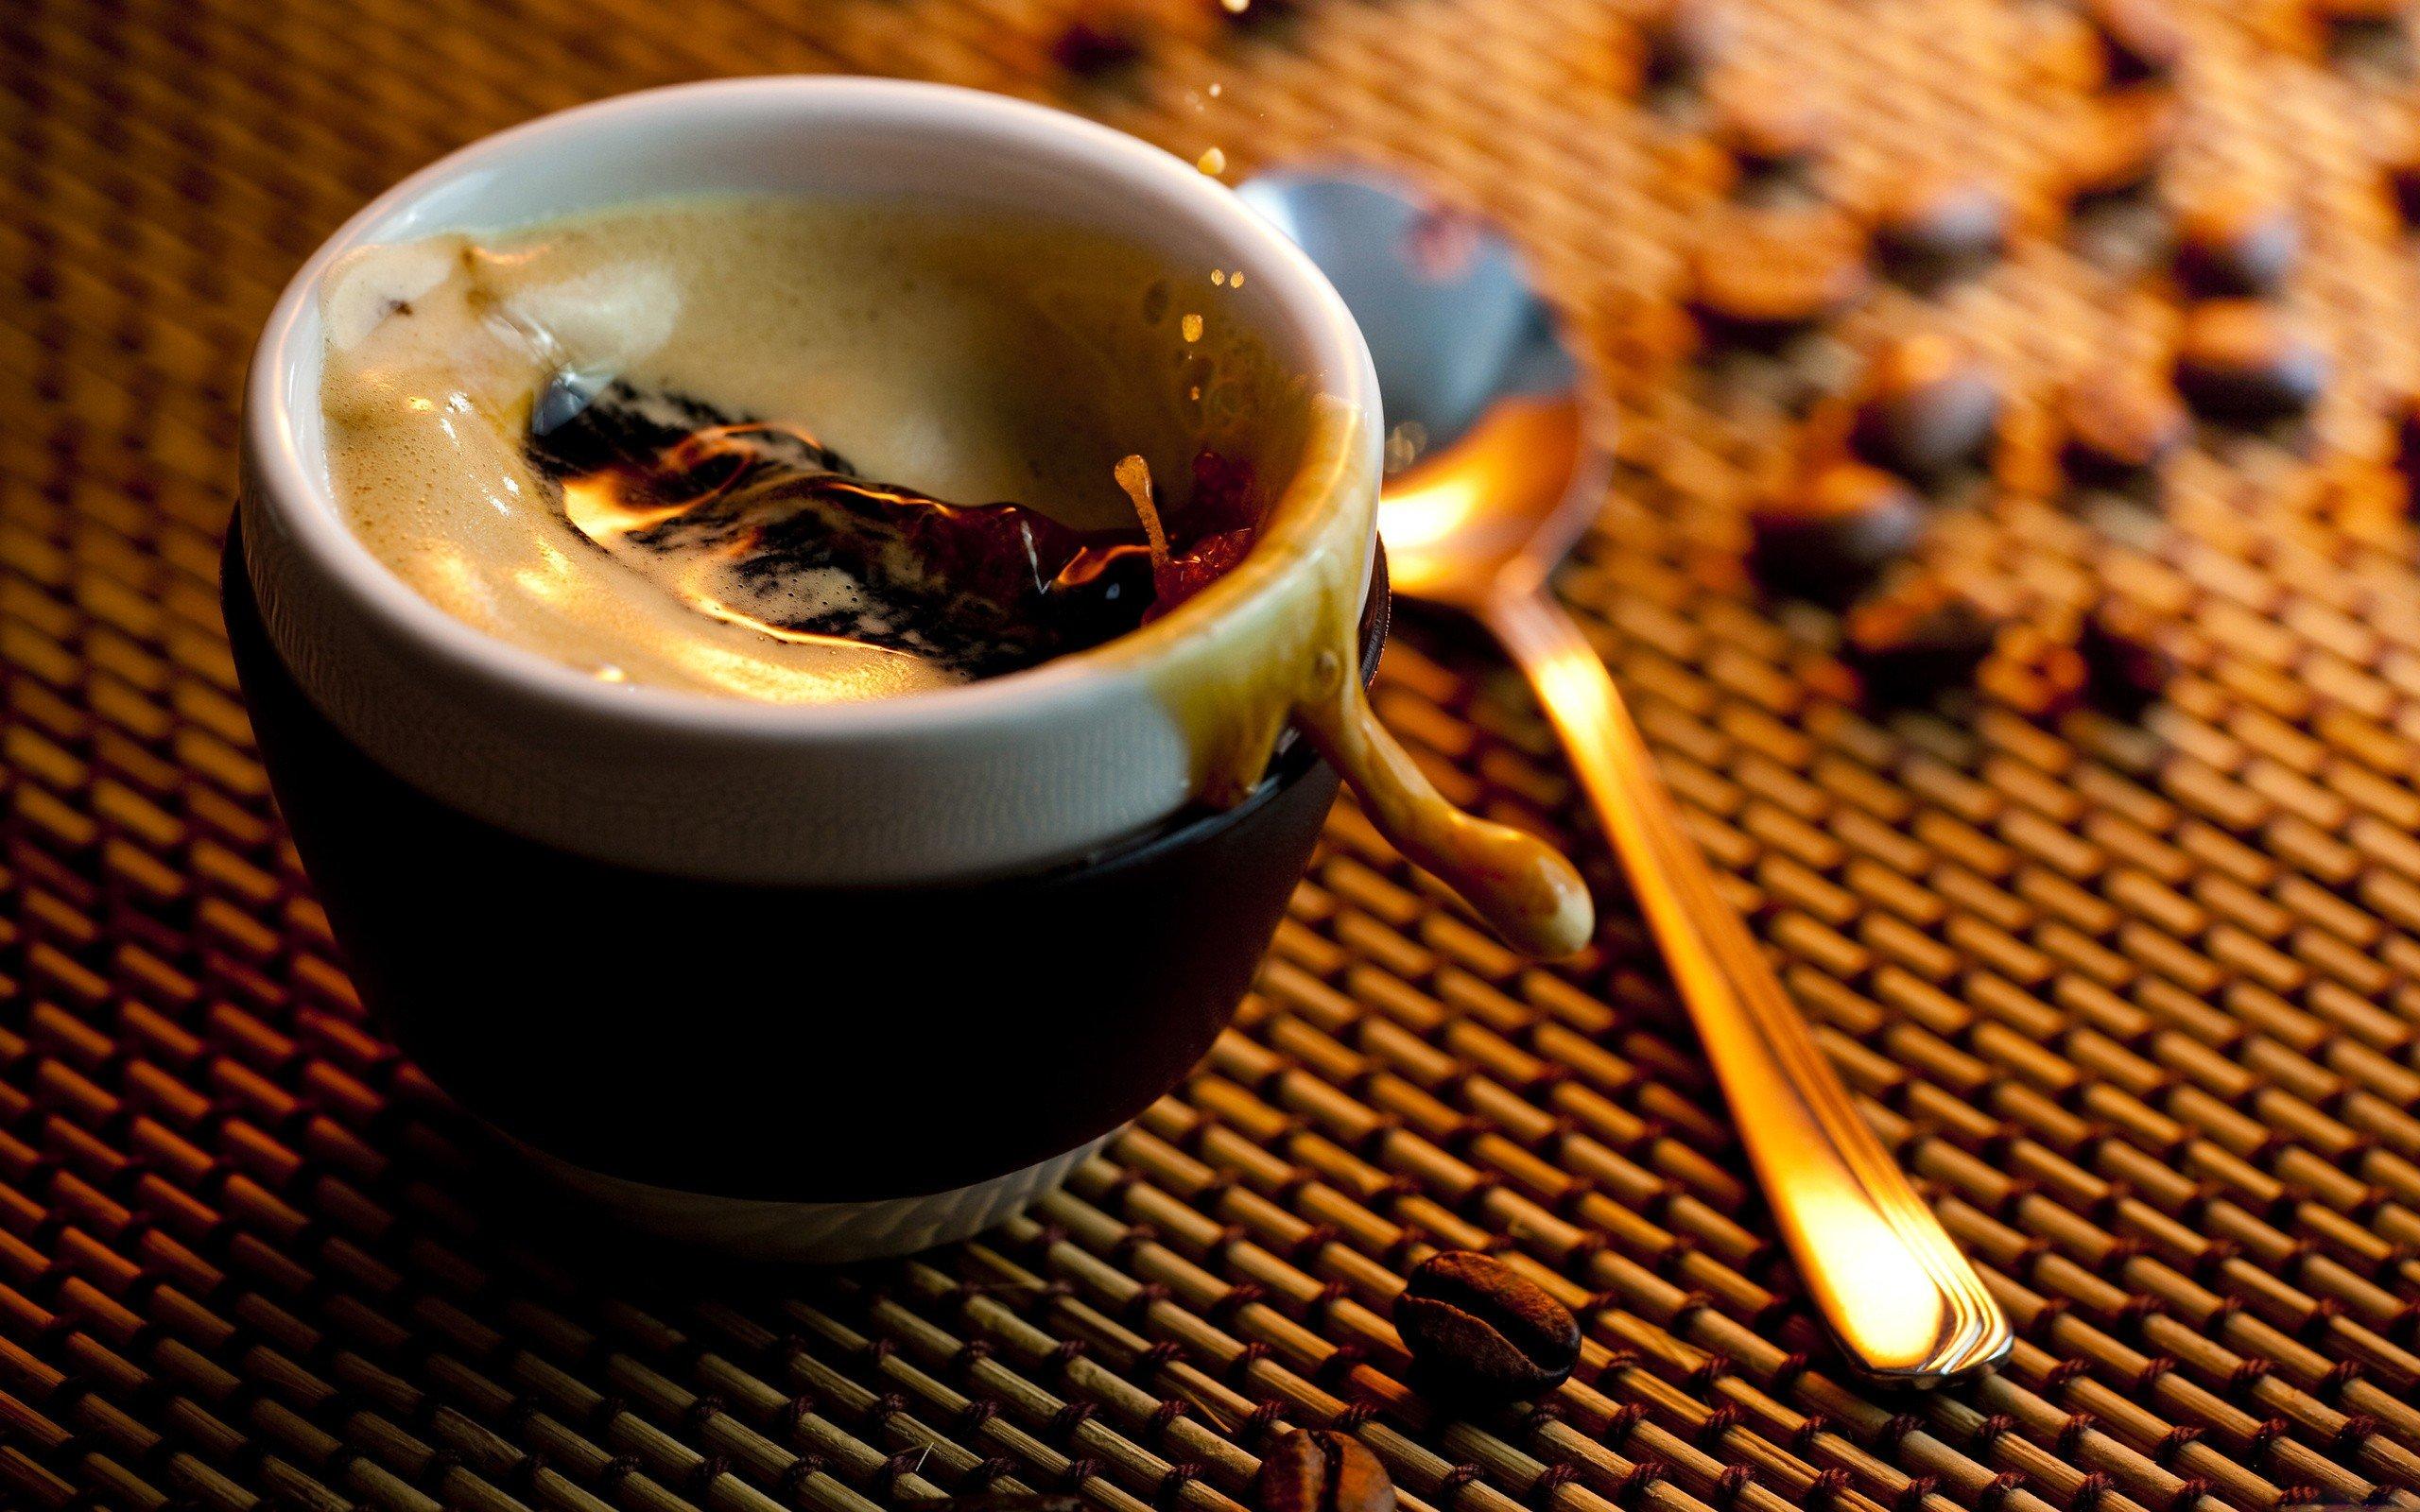 coffee, Spoons, Splashes, Cup, Liquid Wallpaper